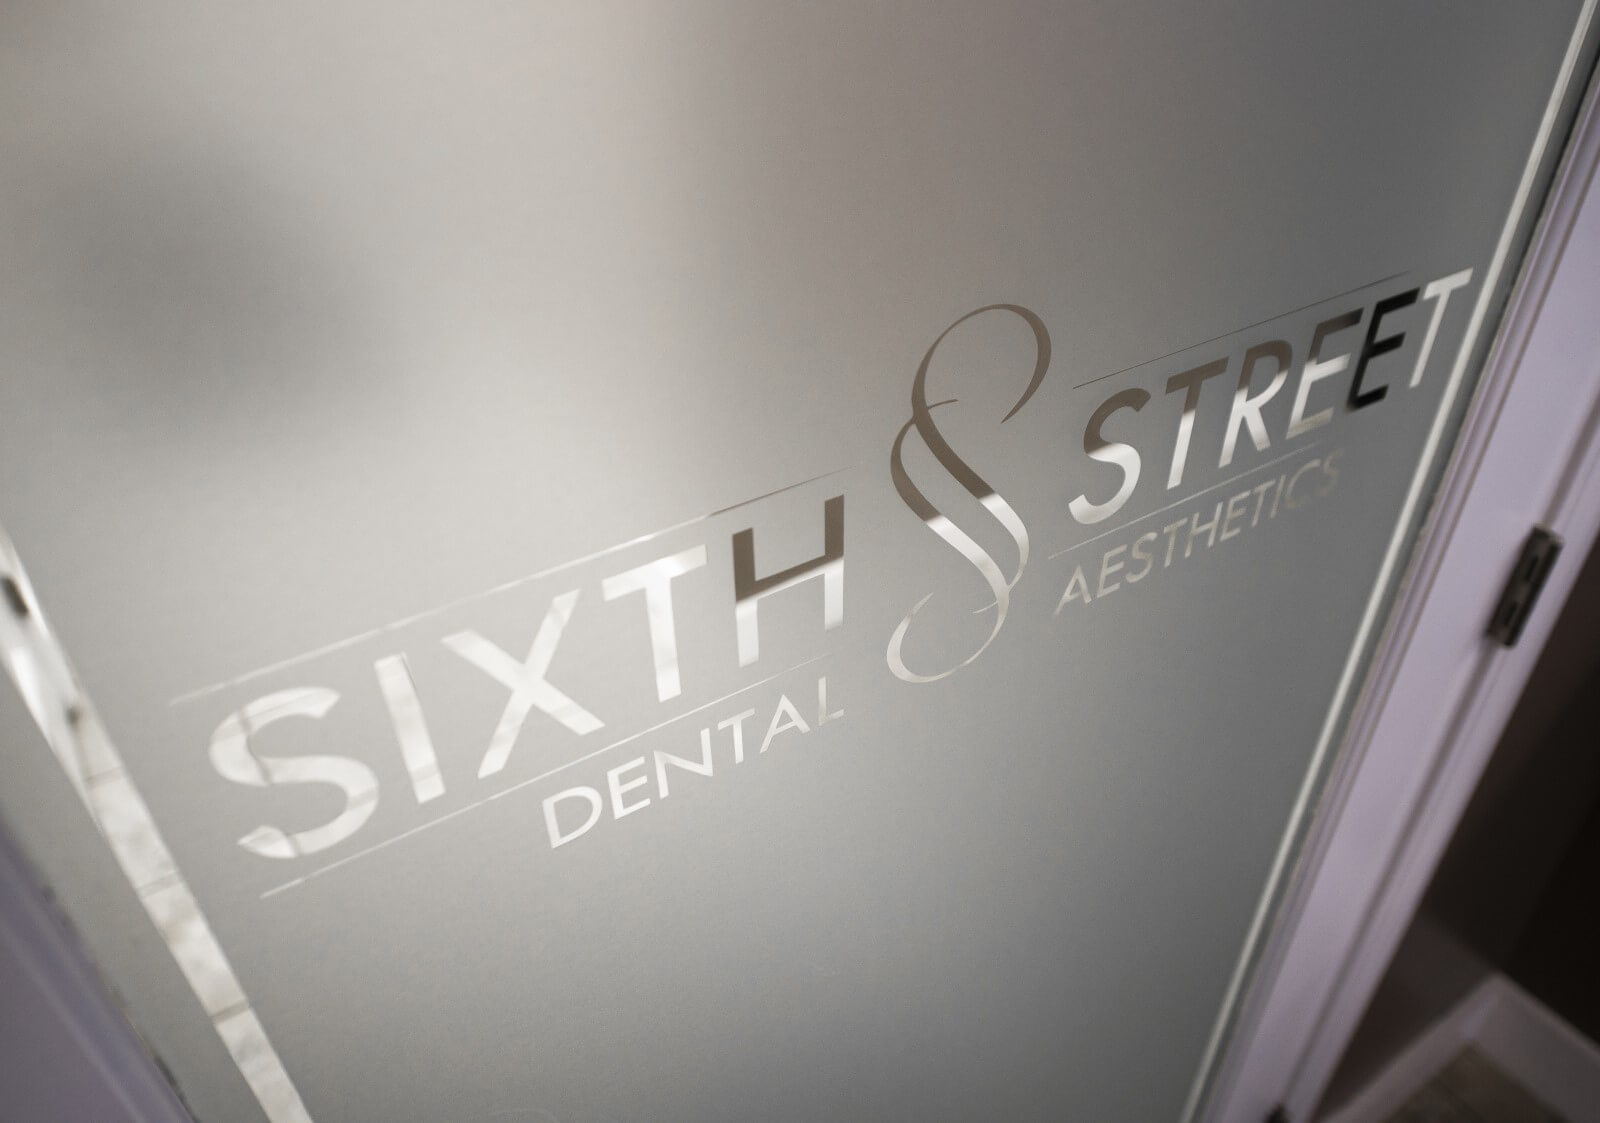 Sixtht Street Dental Logo